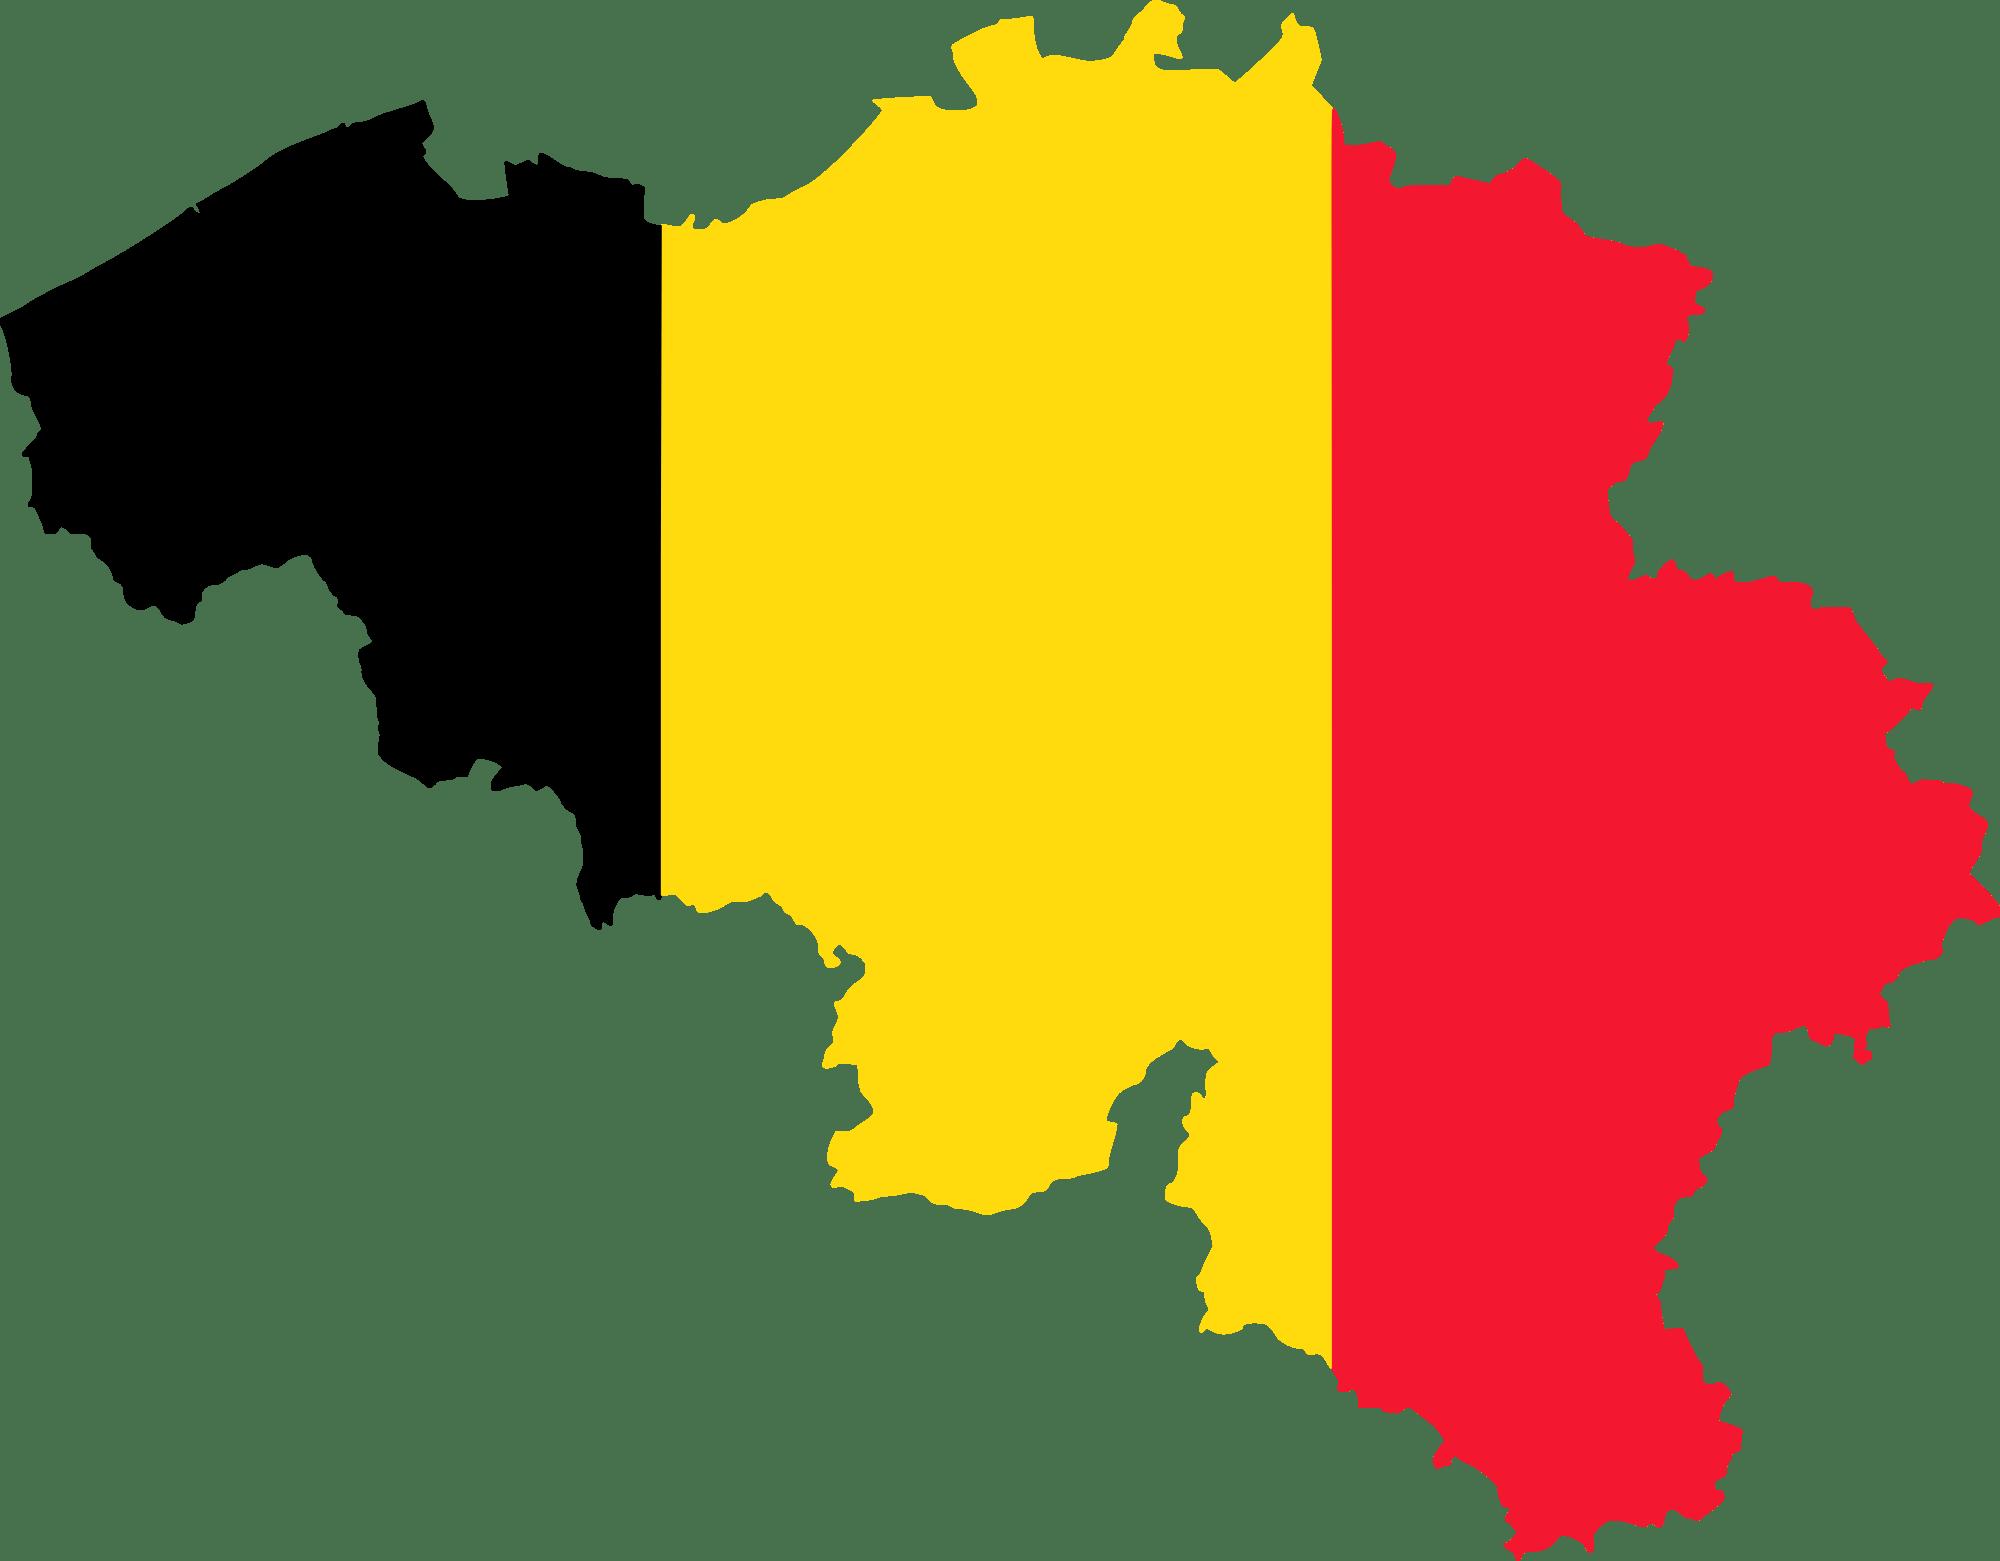 Clipart map transparent. Belgium flag png stickpng